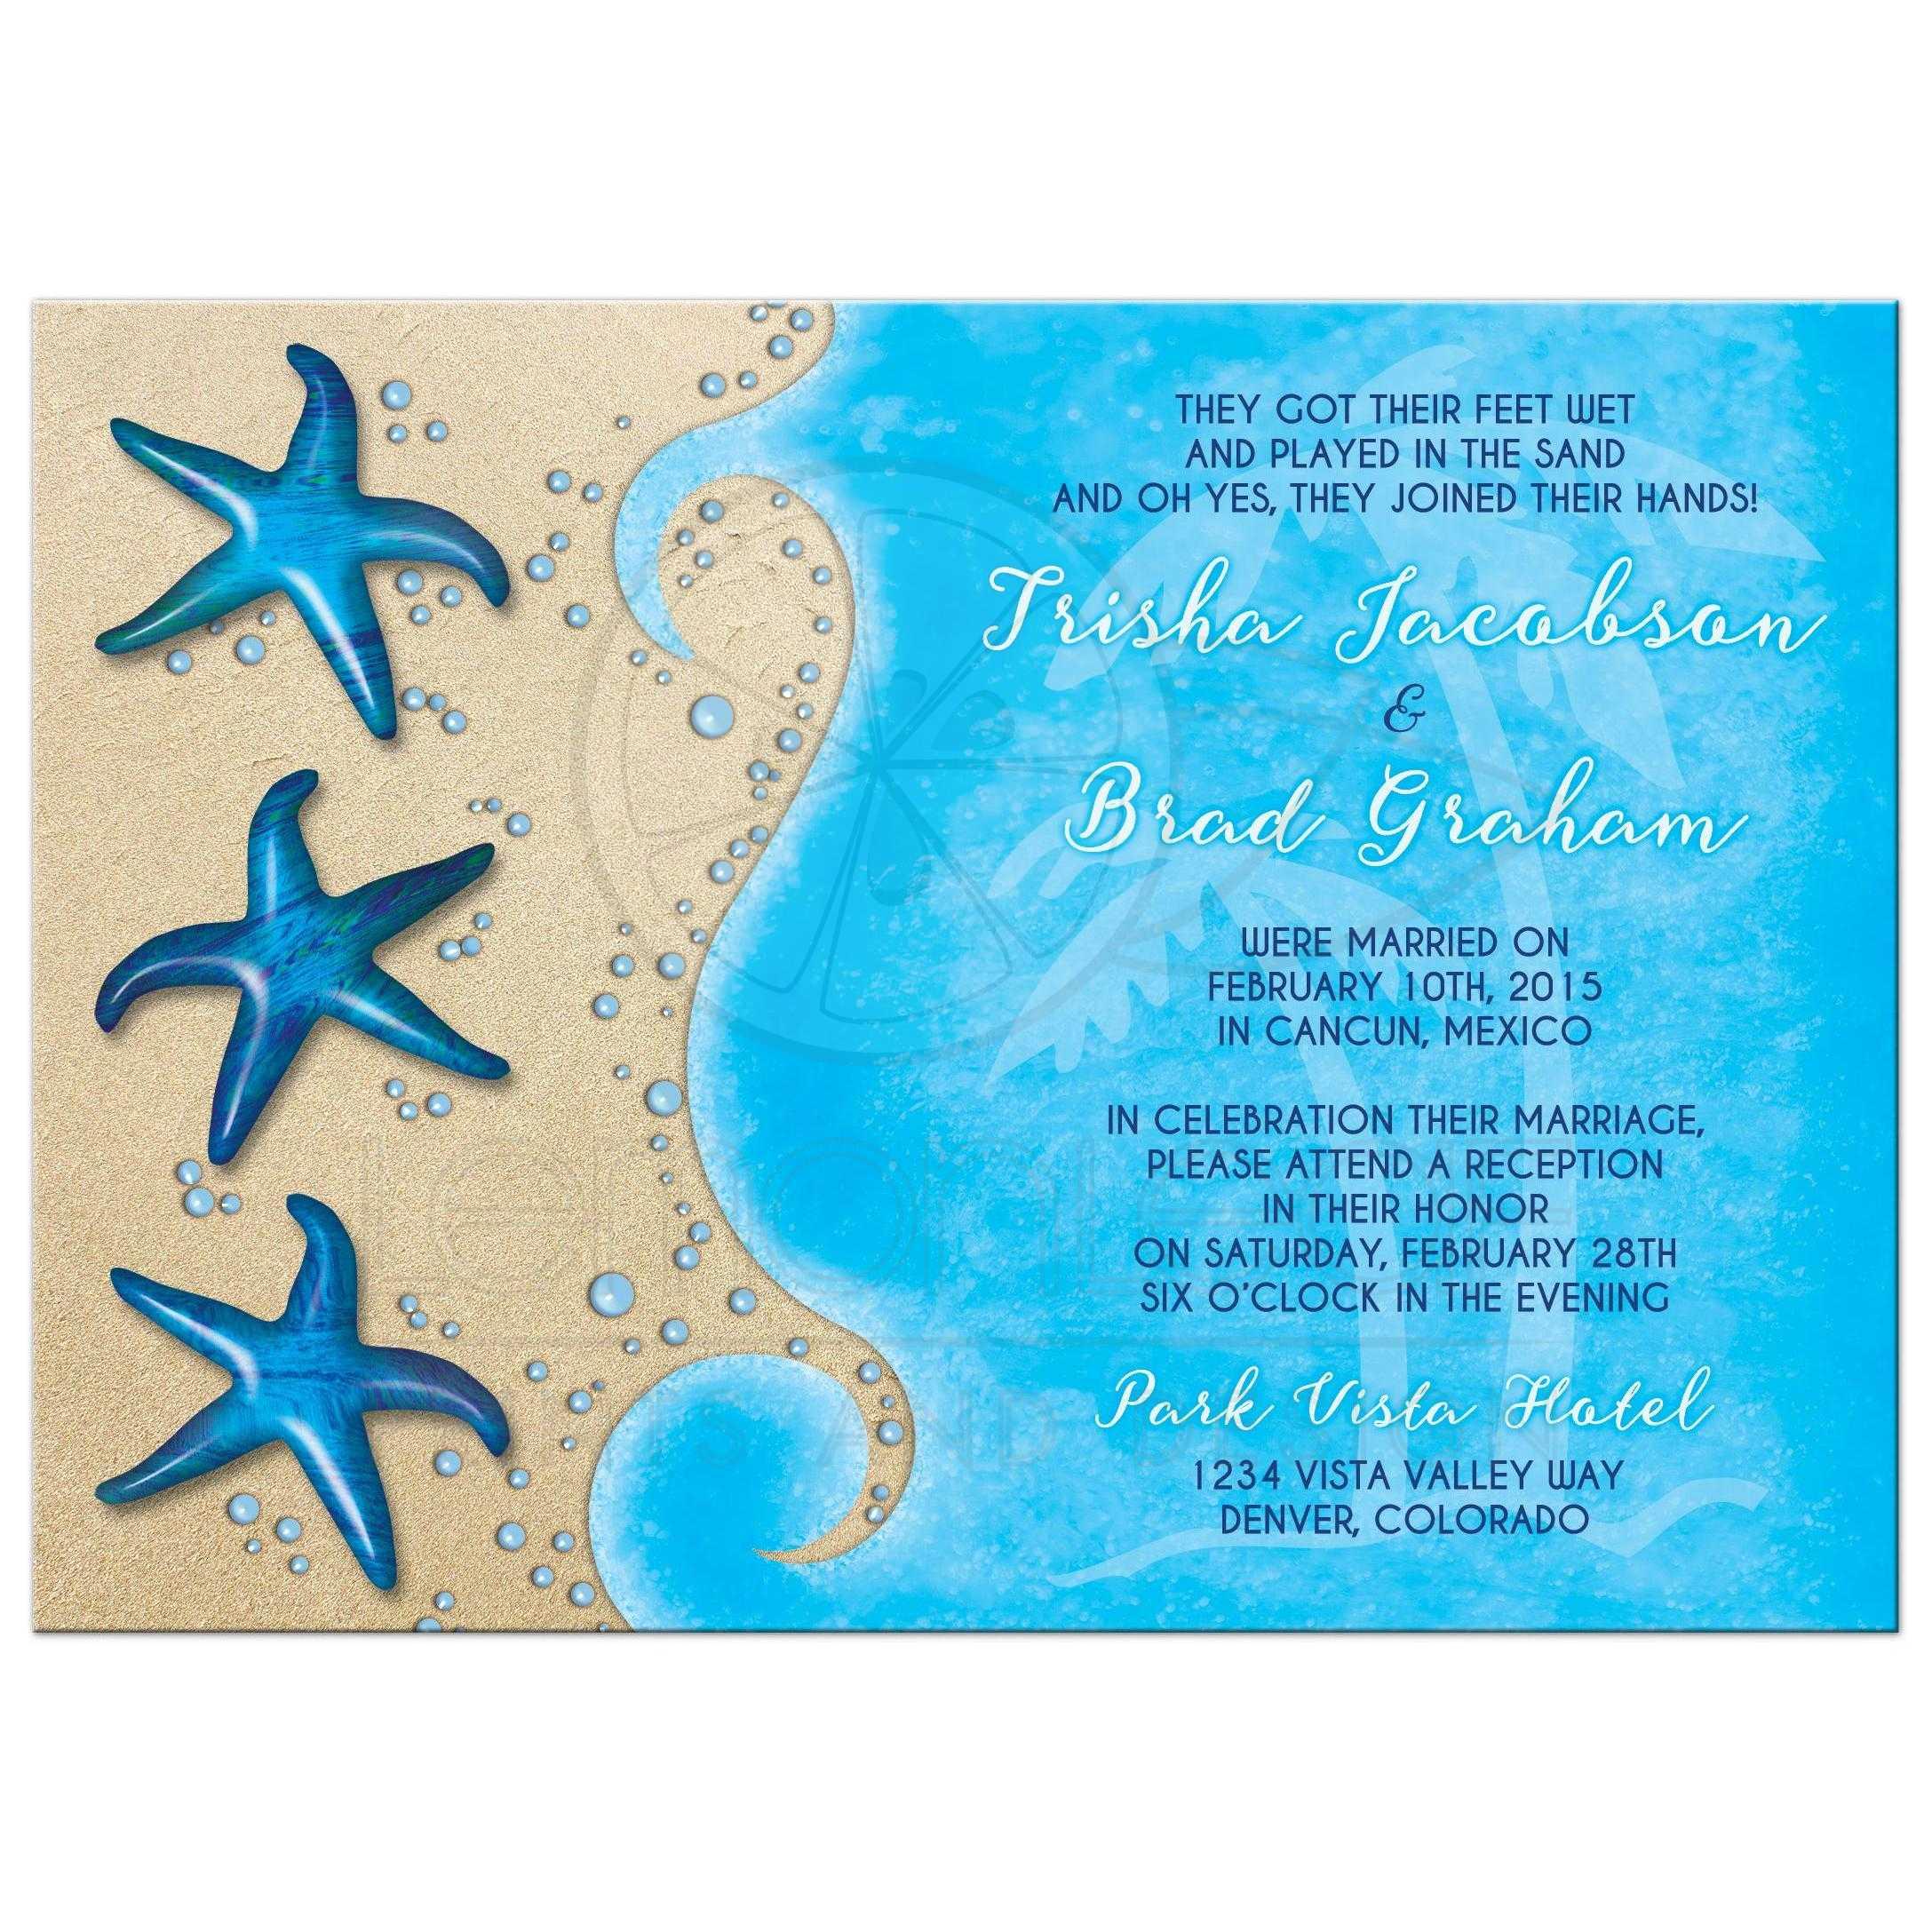 Destination Wedding Reception Ideas: Tropical Post Wedding Reception Only Invitation Paua Shell